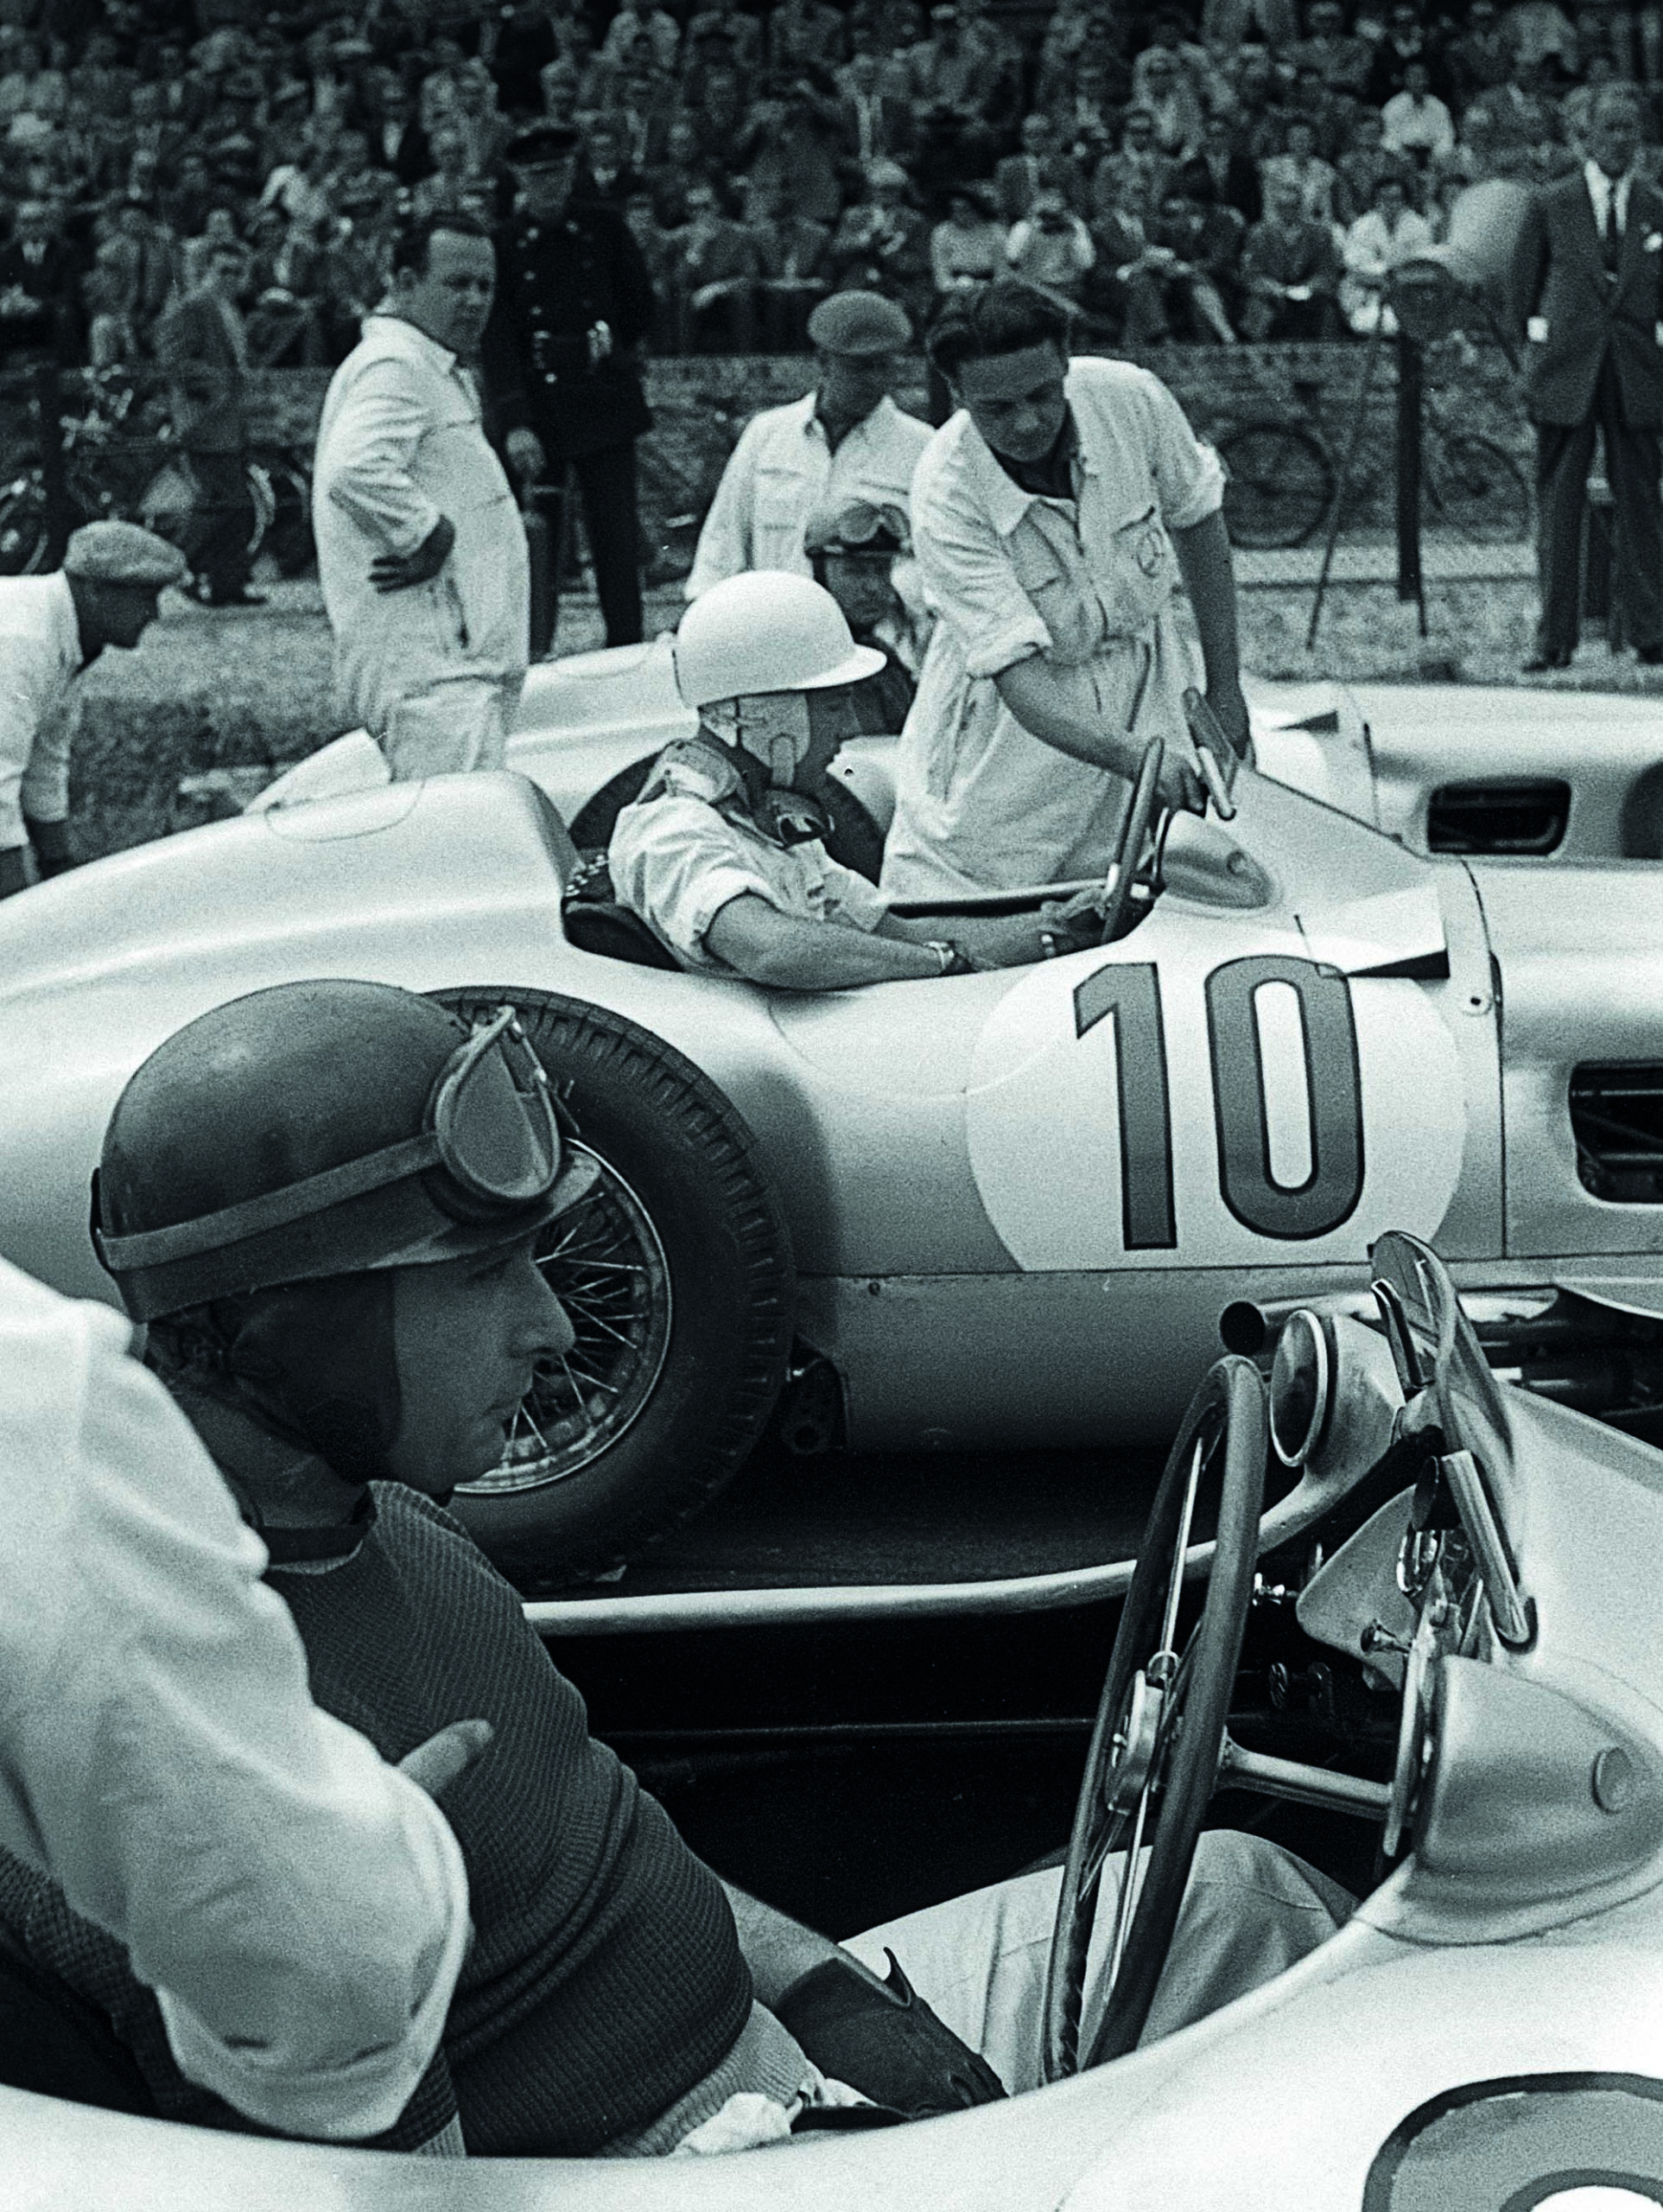 Stirling-Moss-alongside-Juan-Manuel-Fangio-in-the-1955-Dutch-Grand-Prix